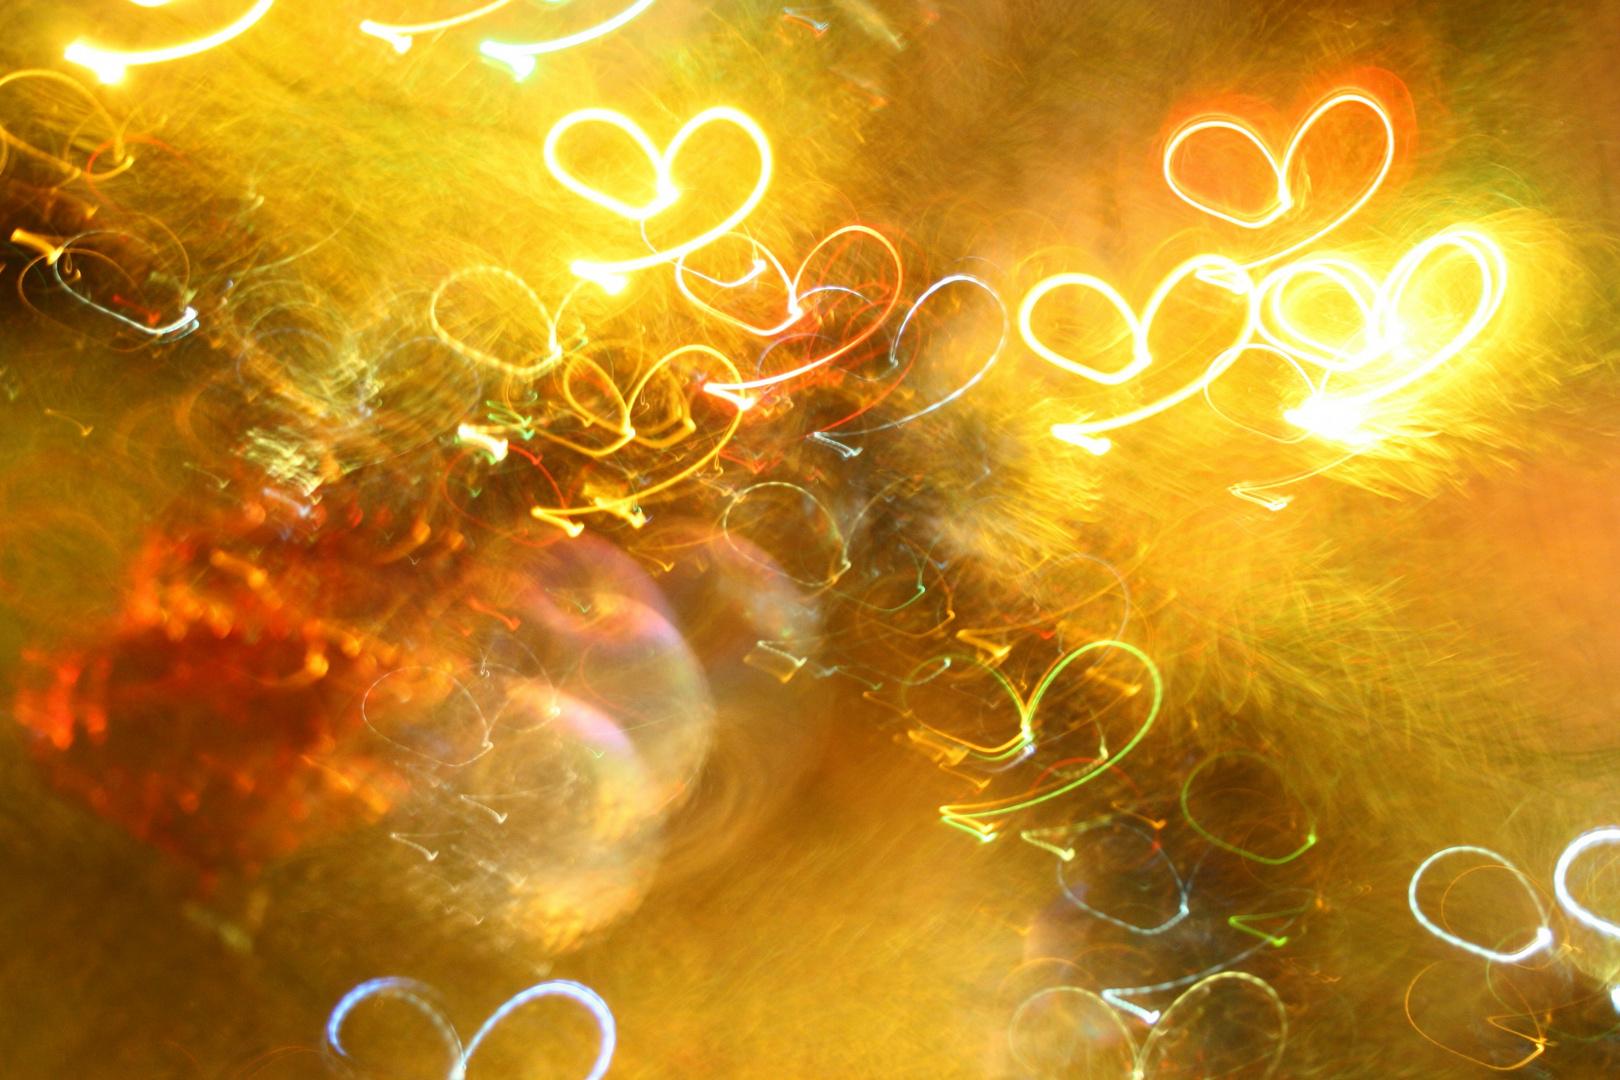 Hearts of light